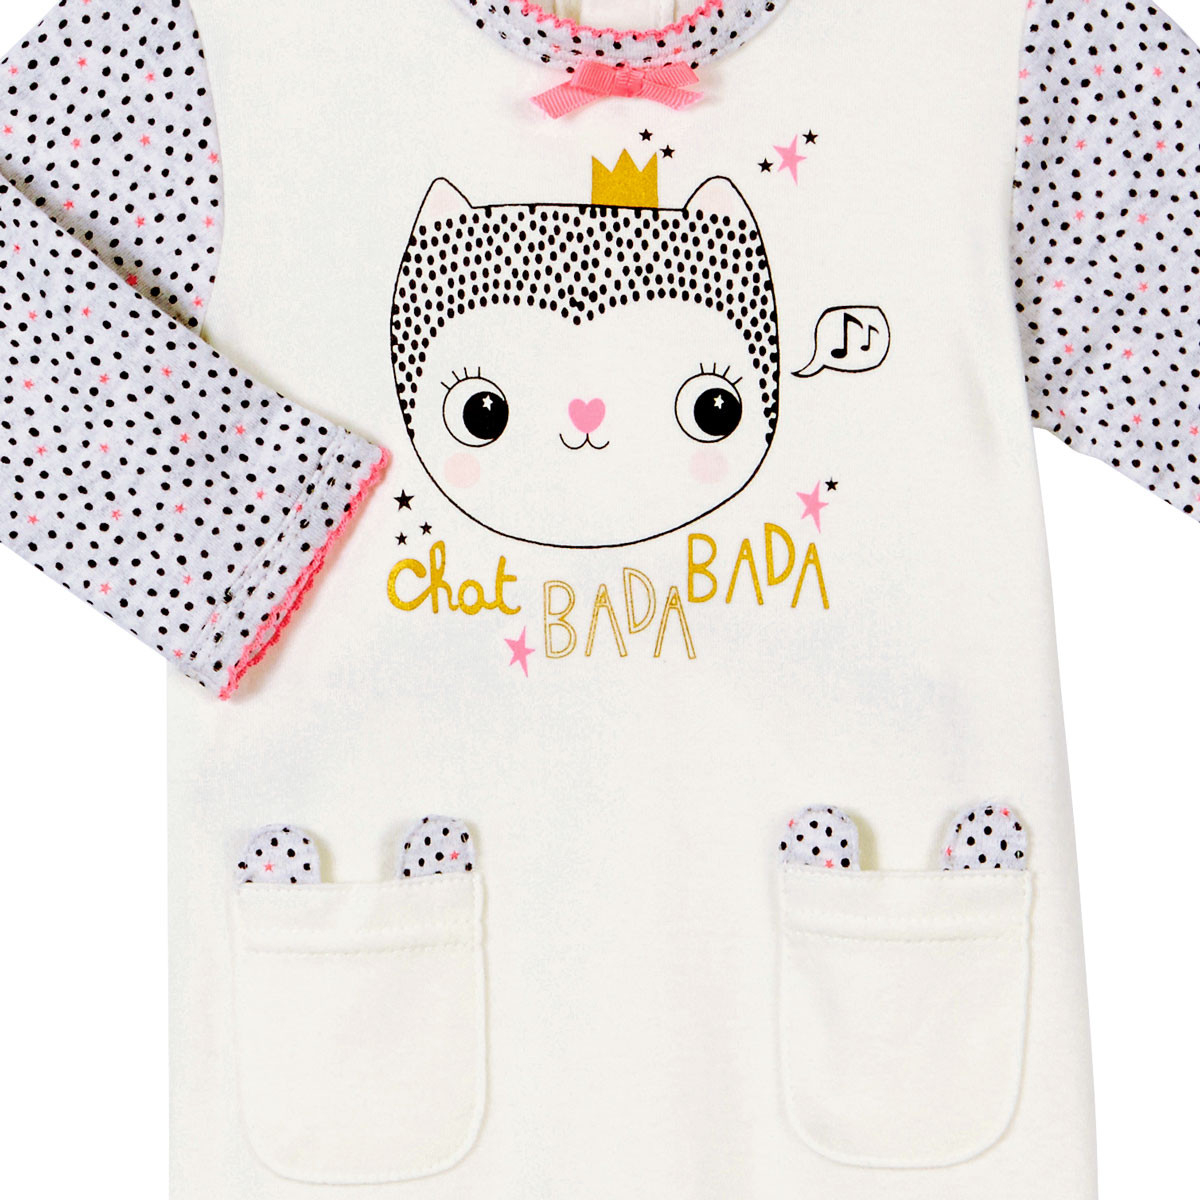 Pyjama bébé fille Chatbada